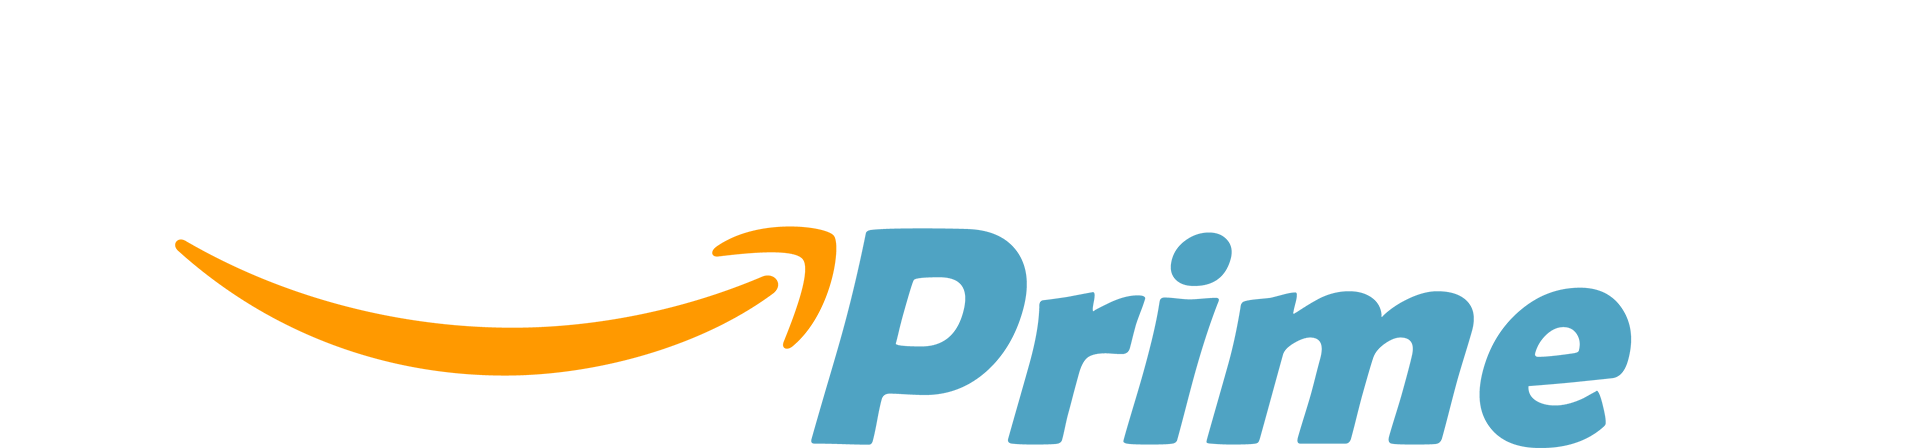 Amazon_Prime_logo_full-1.png